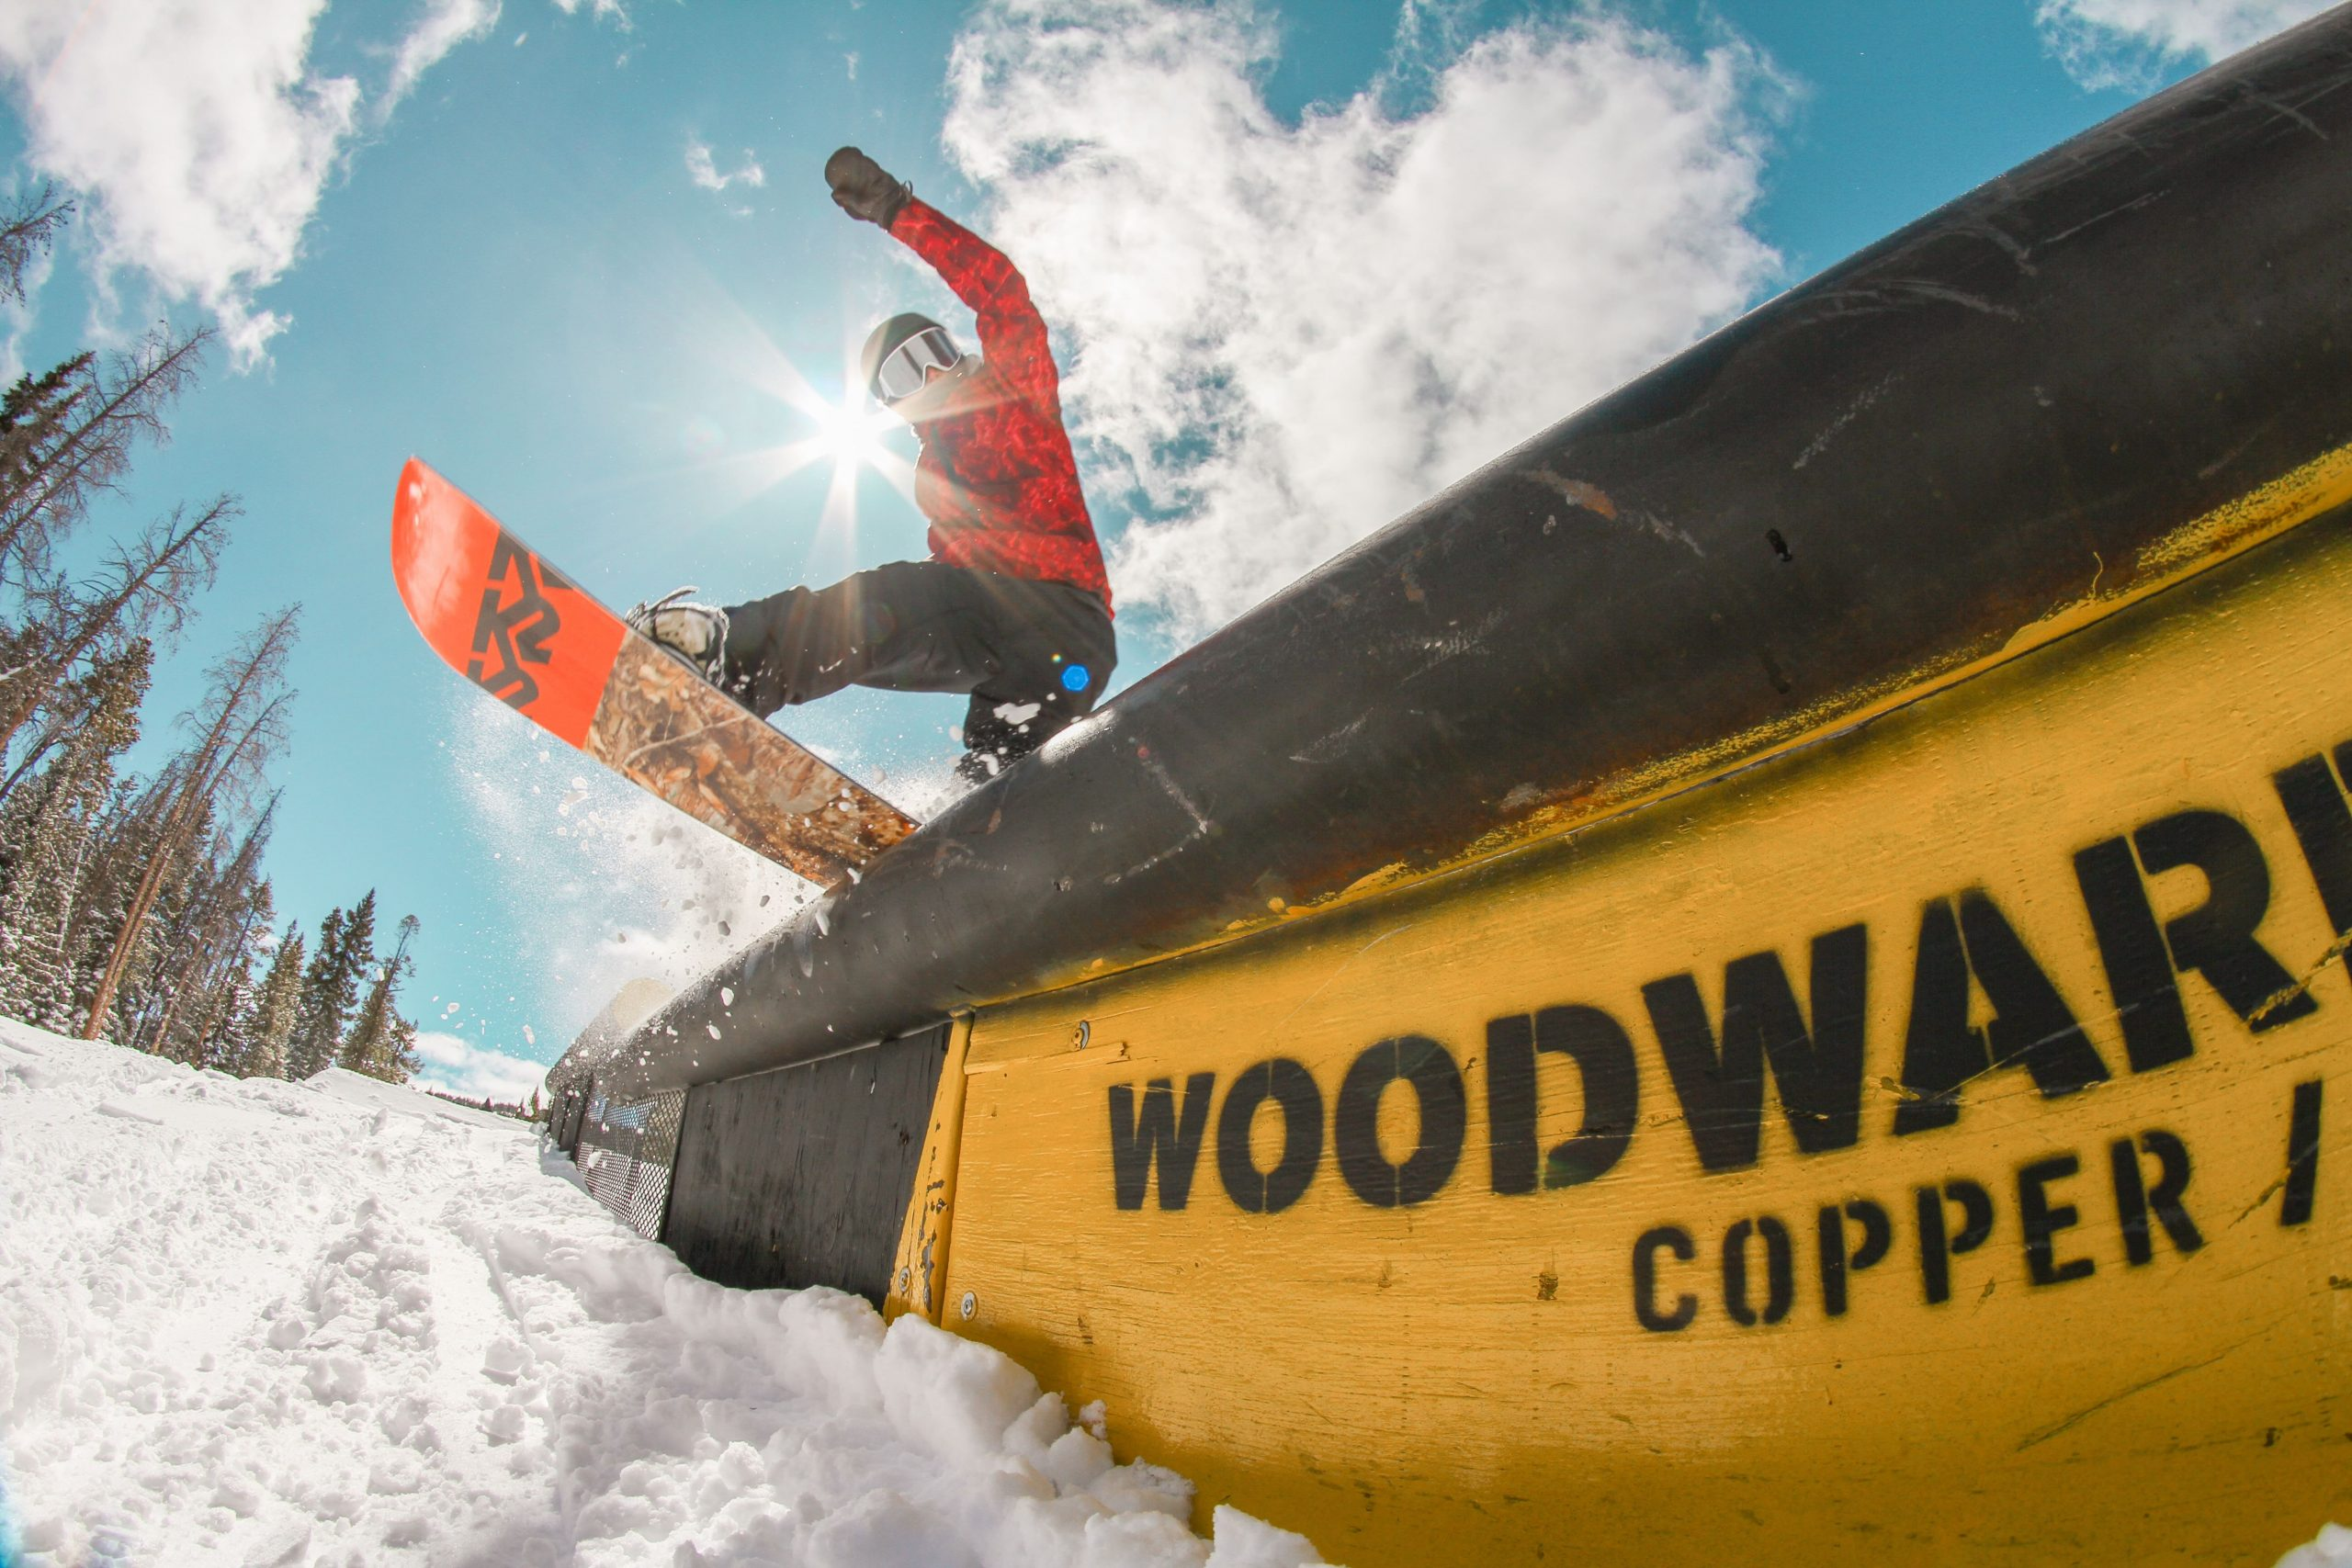 woodward grind